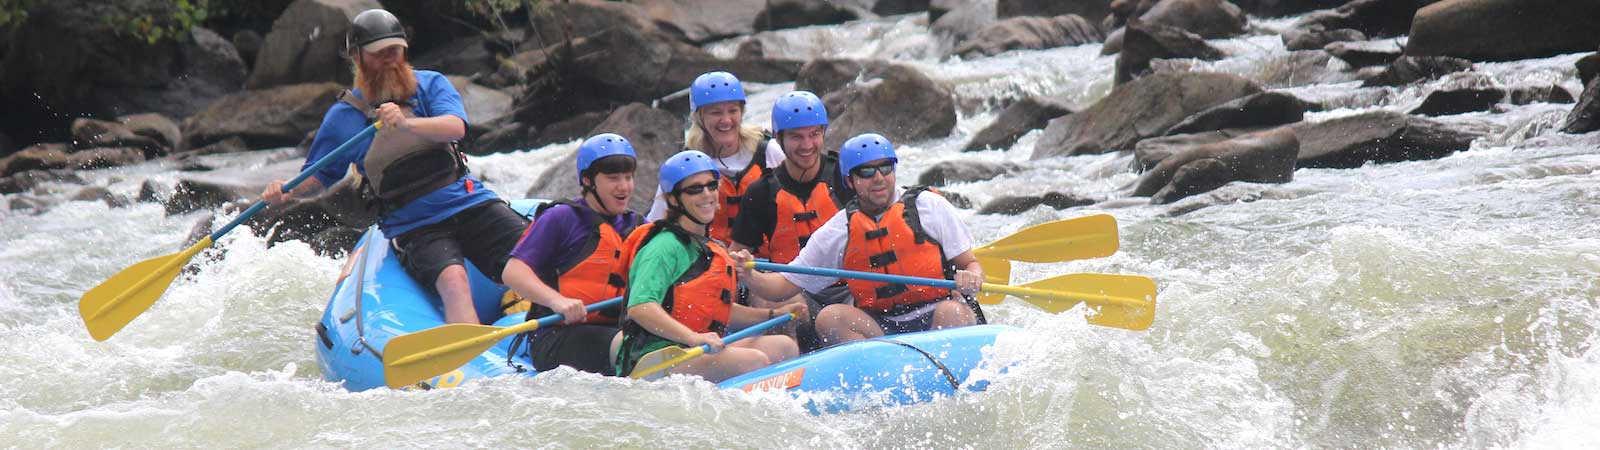 ocoee river rafting through grumpy rapid